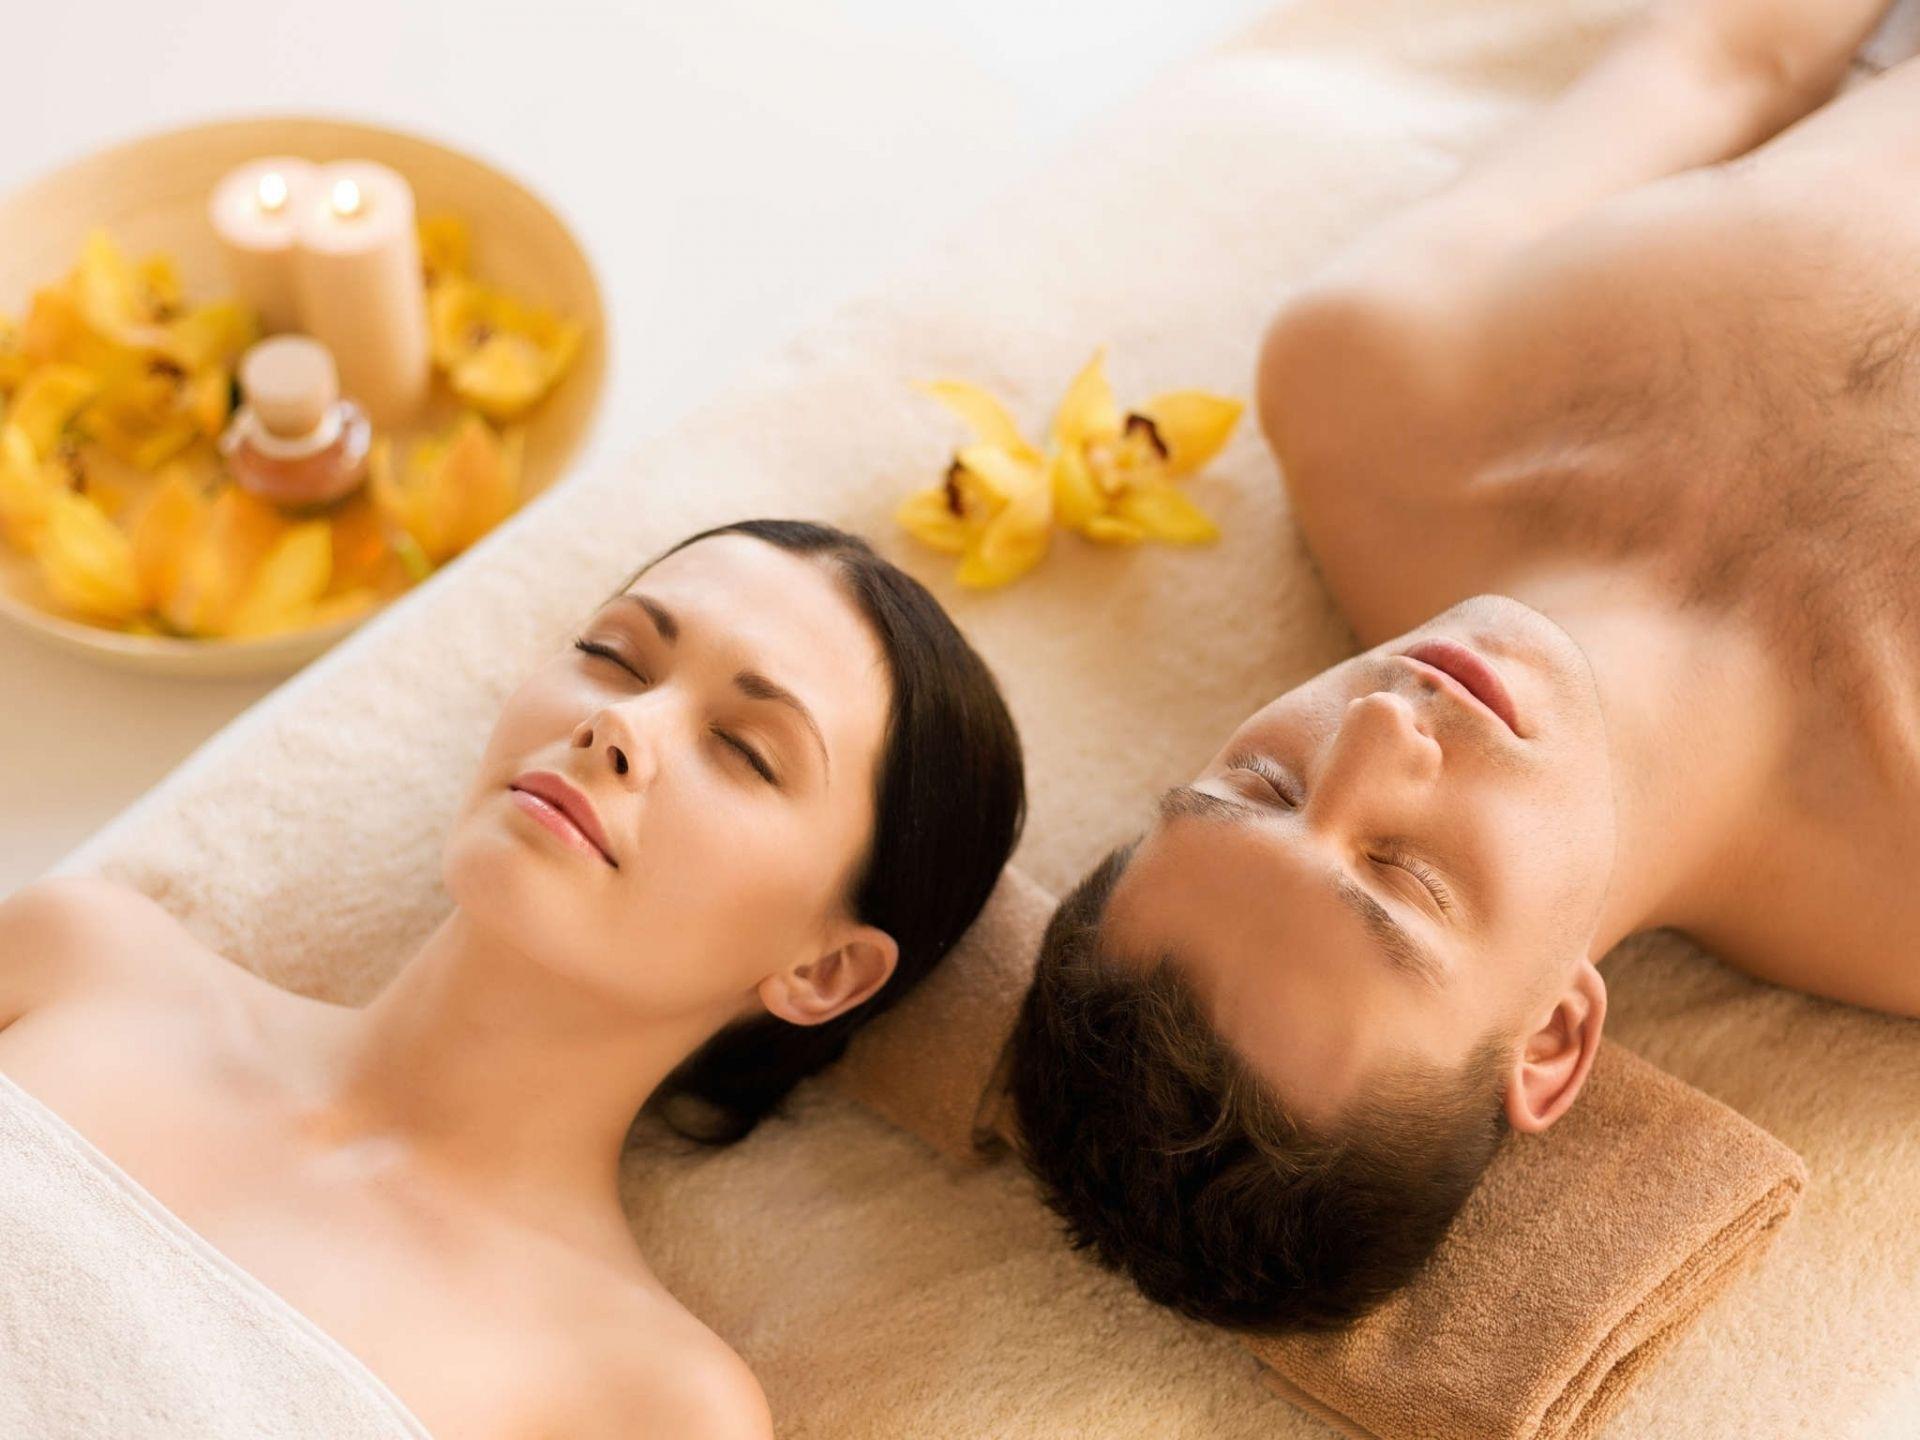 The world of massage